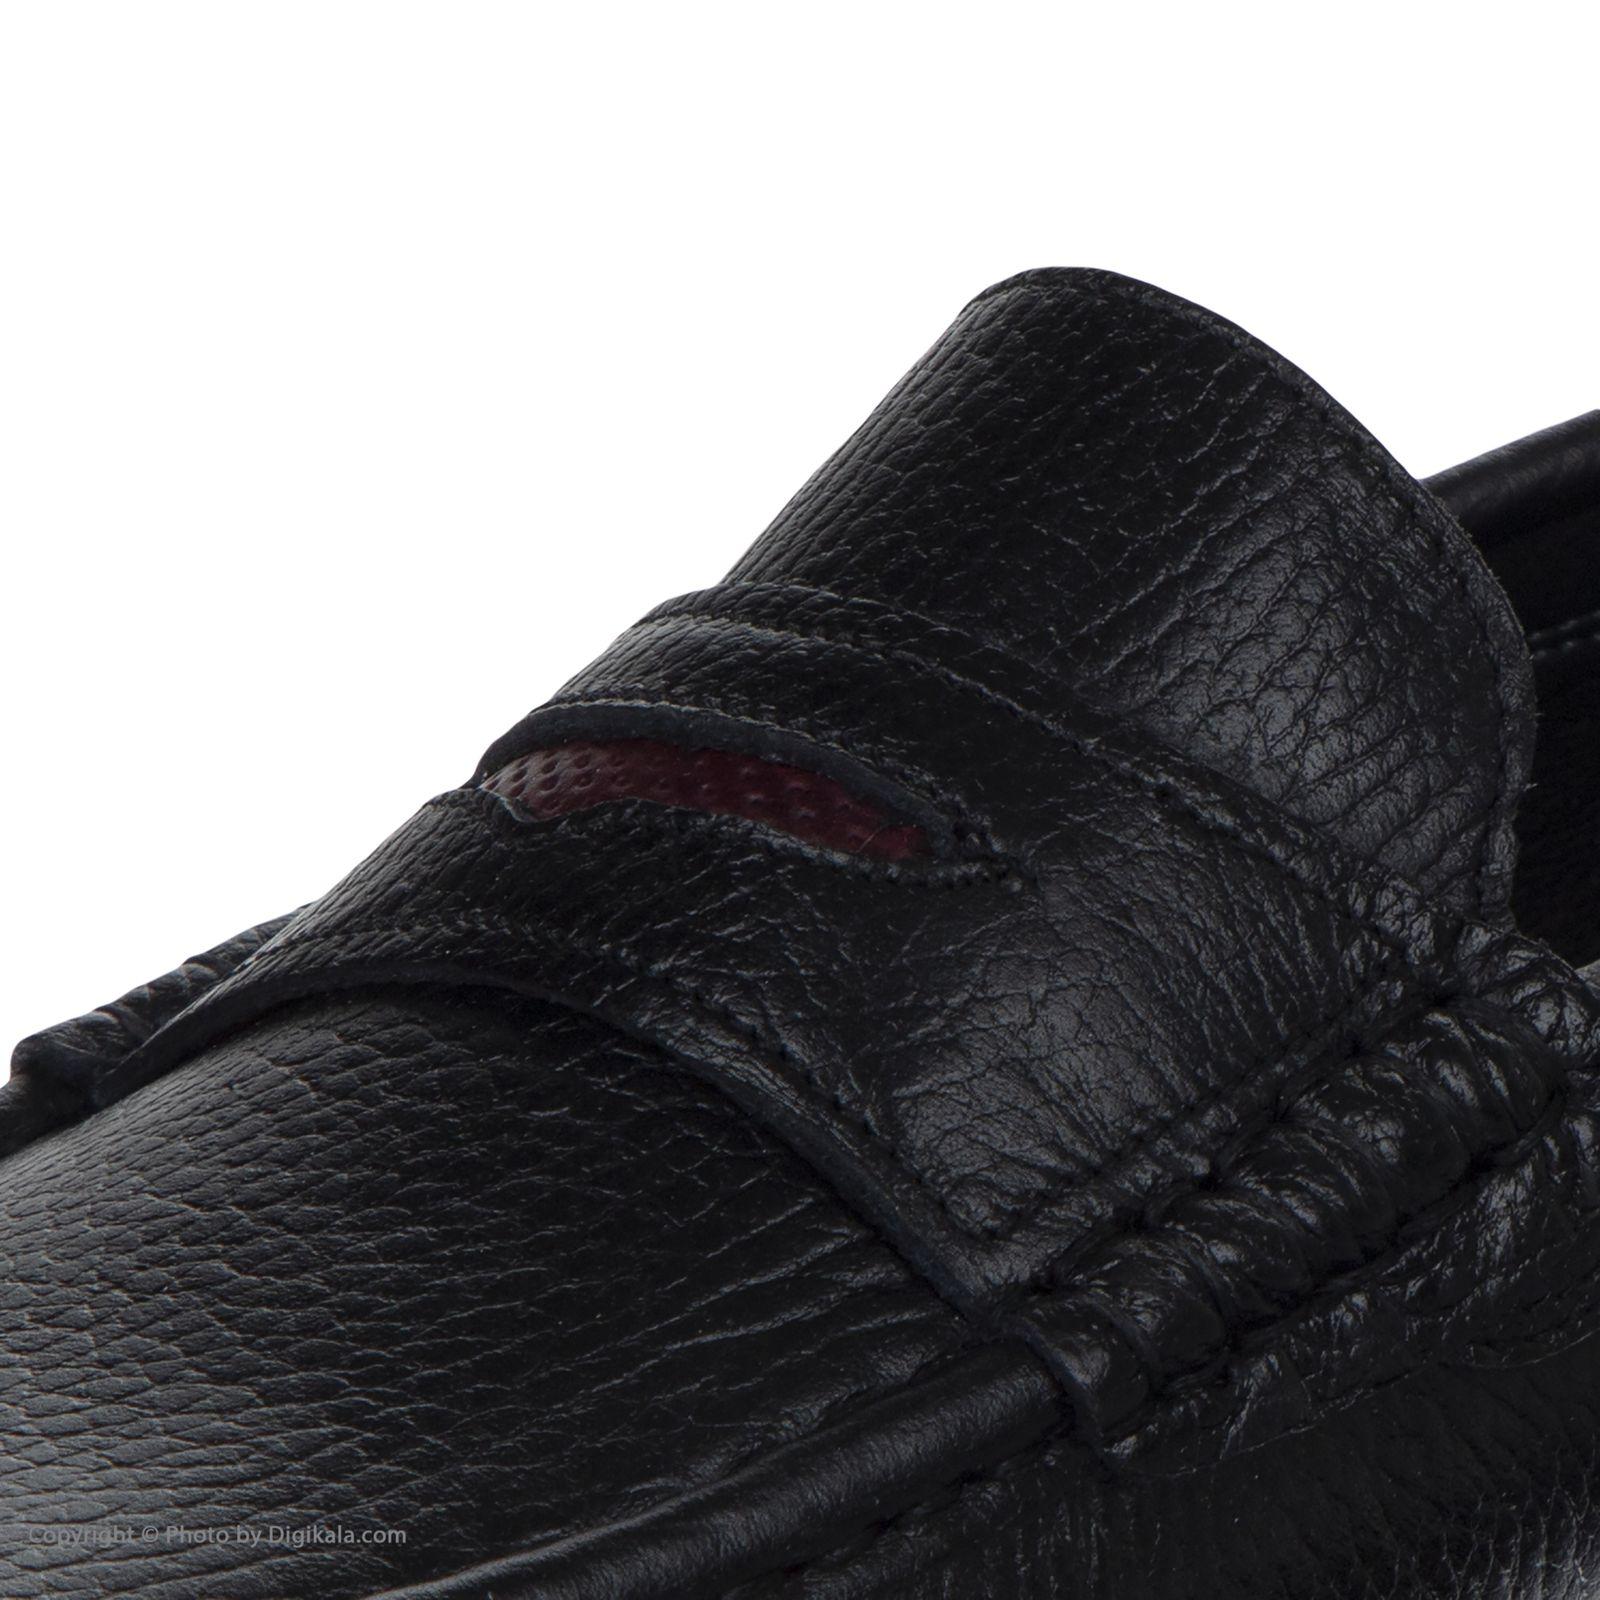 کفش روزمره مردانه ساتین مدل 7611A503101 -  - 9